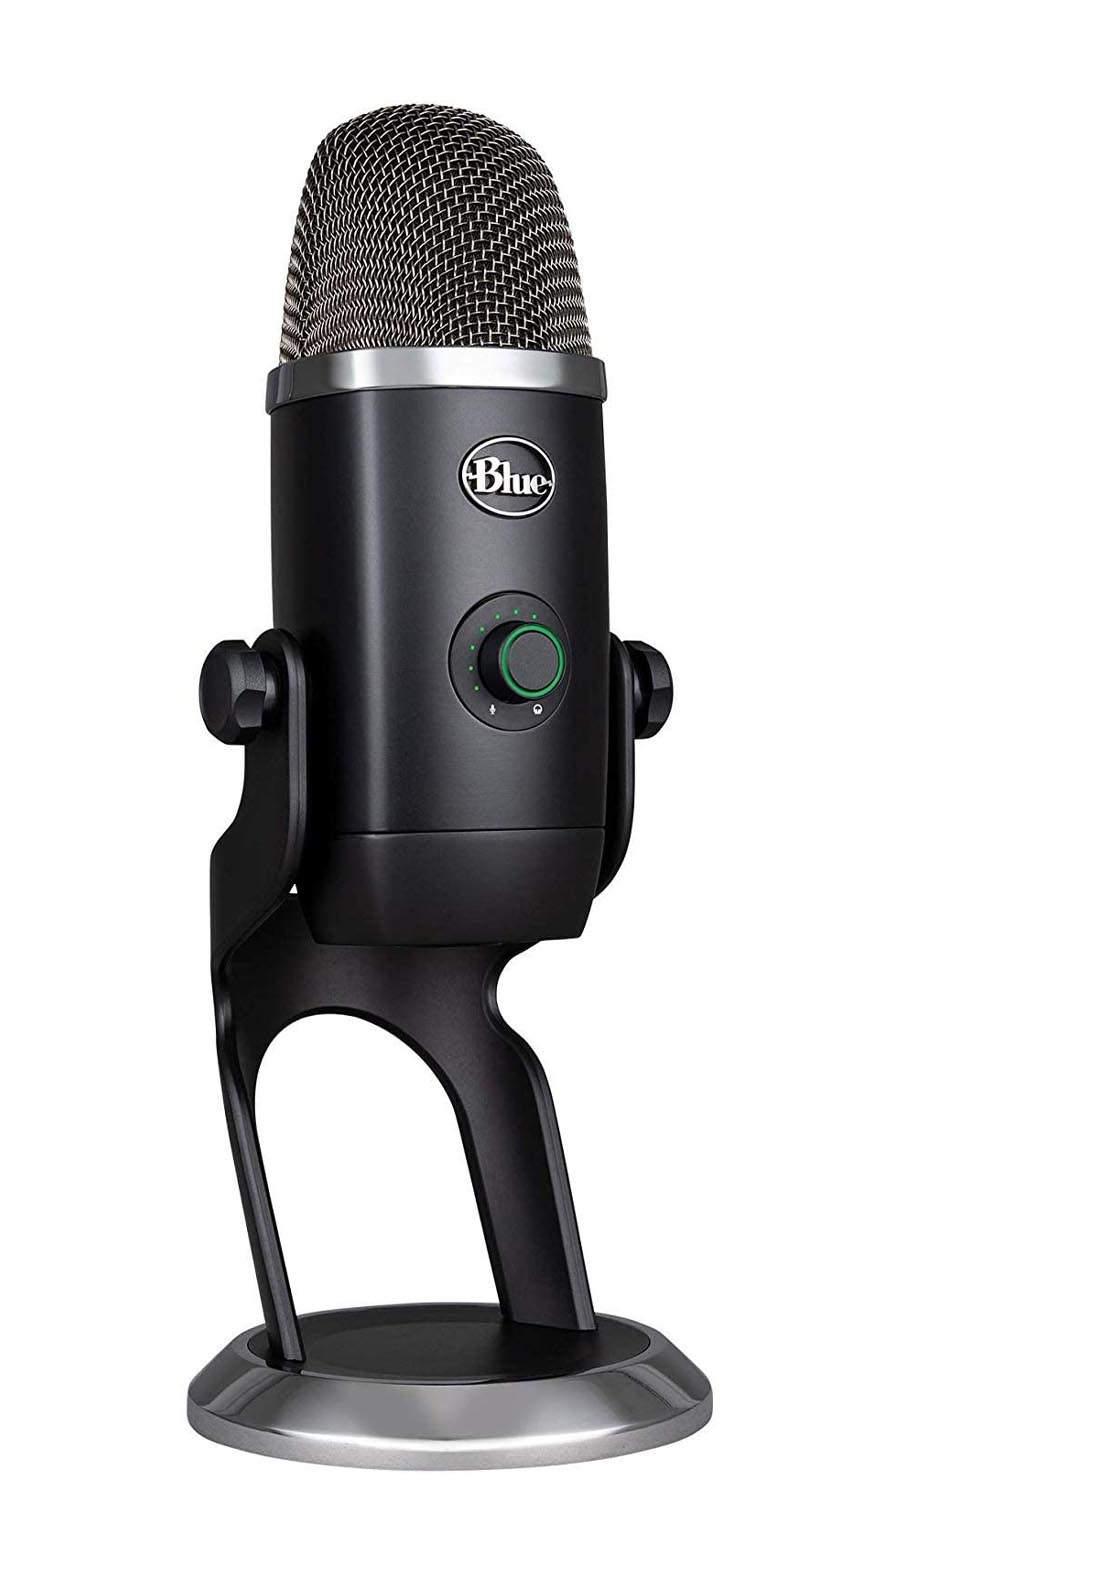 Blue Yeti X Professional Condenser USB Microphone  - Black مايكرفون